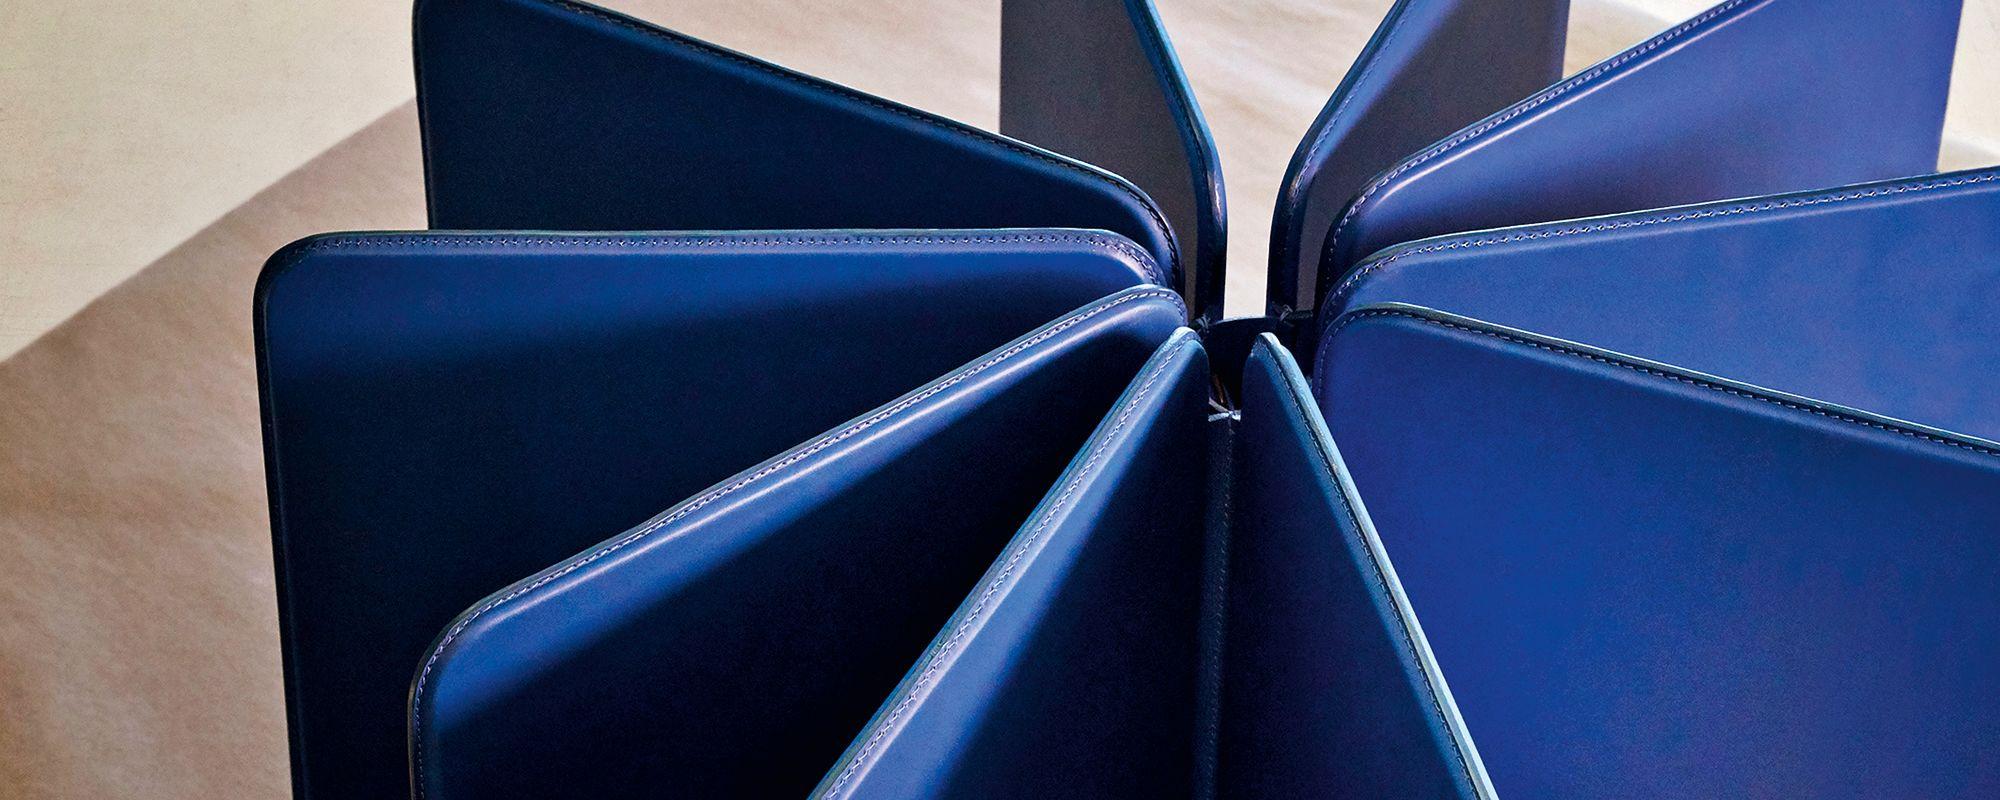 Louis Vuitton und India Mahdavi, Objets Nomades